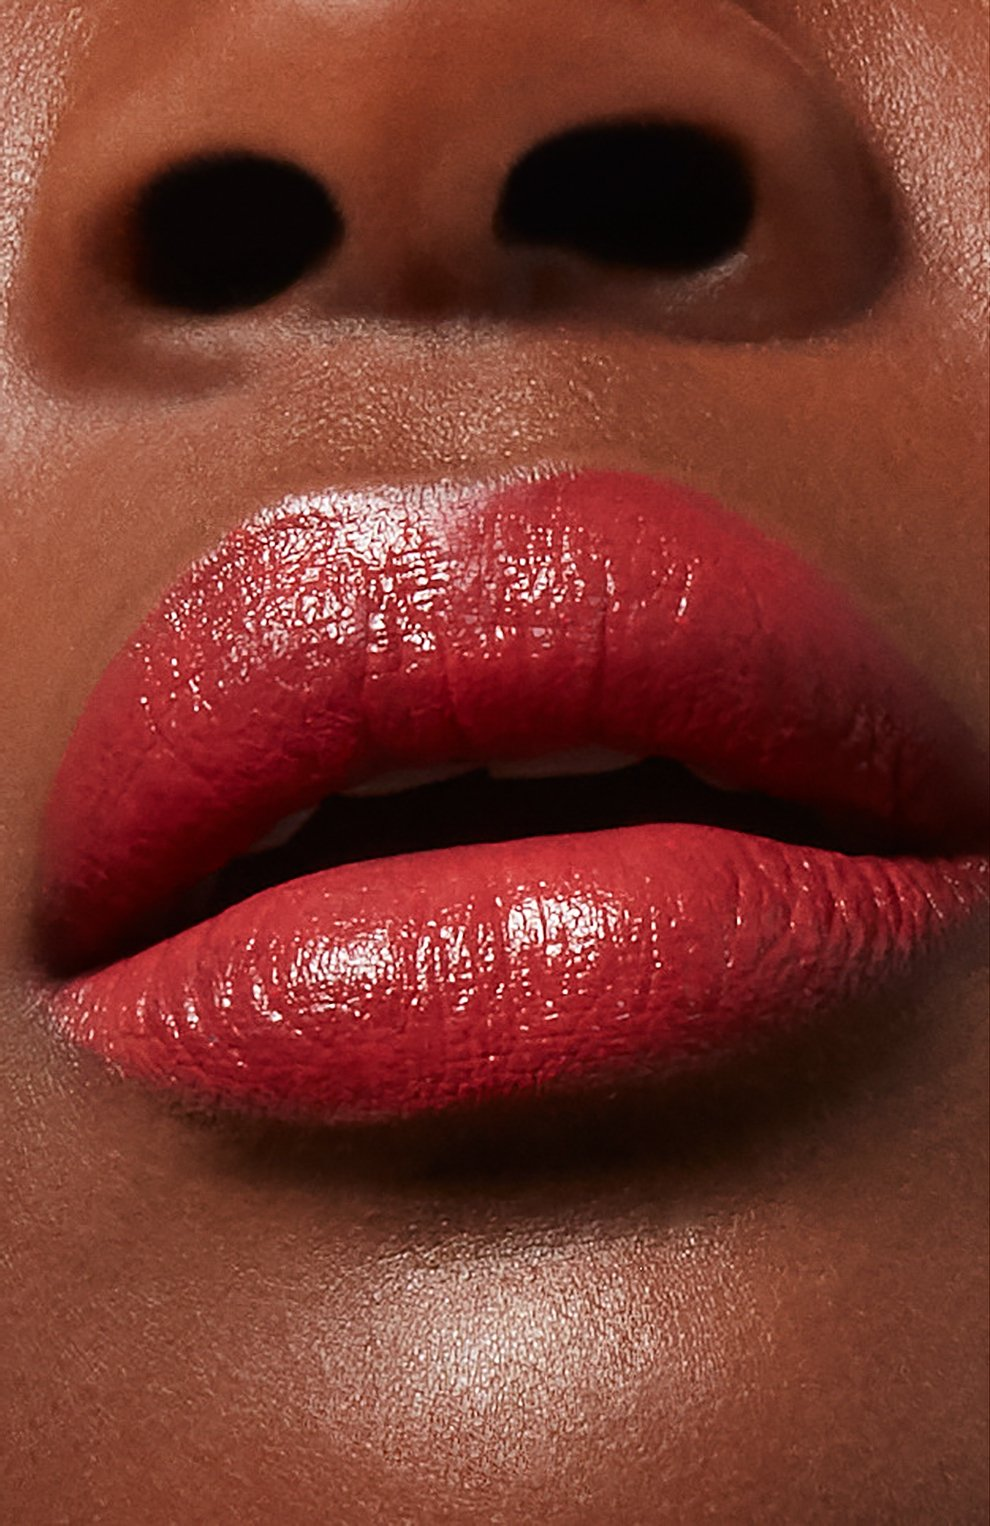 Губная помада rosso valentino satin, 405a (3.5g) VALENTINO бесцветного цвета, арт. 3614273229012   Фото 5